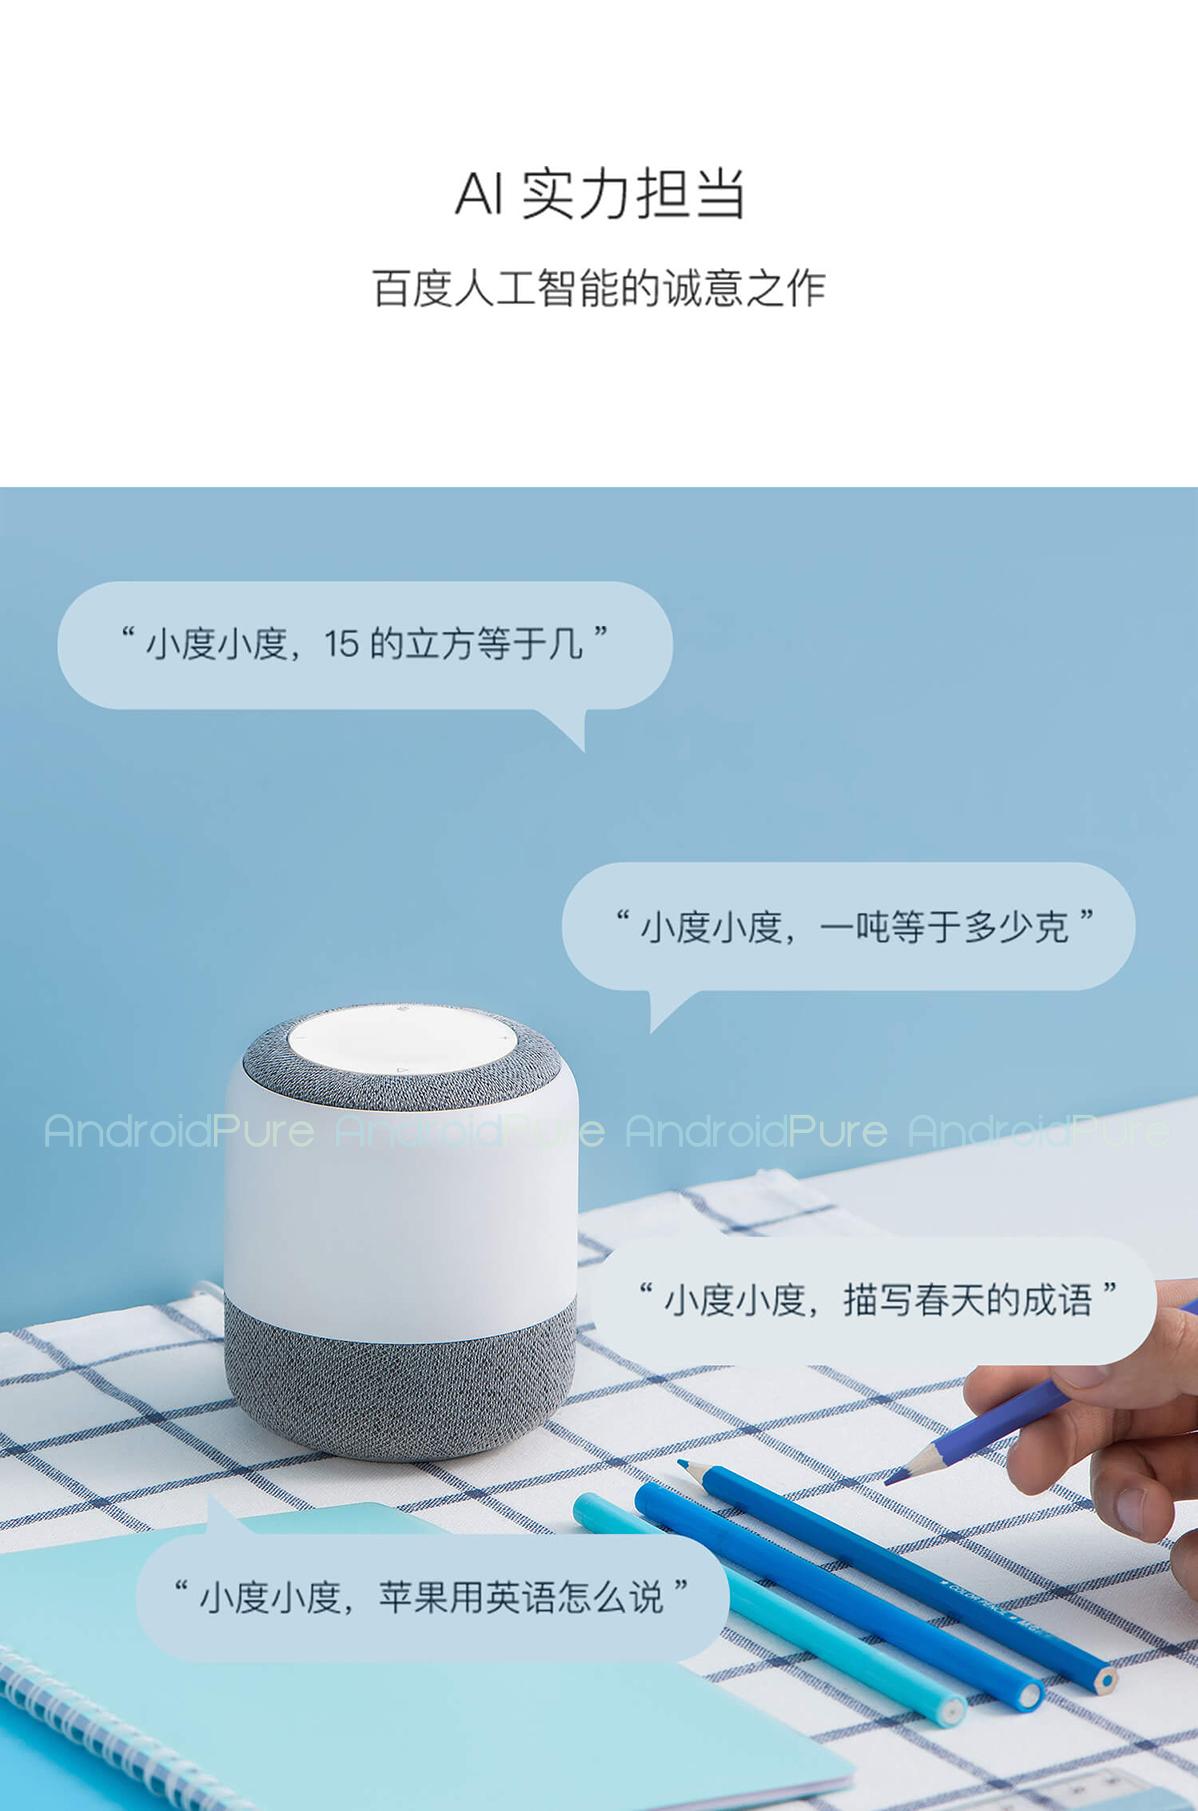 Moto AI Speakers Amazon Echo11 All about Motorola AI Assistant speakers, like Amazon Echo or Google Mini [Updated] 3